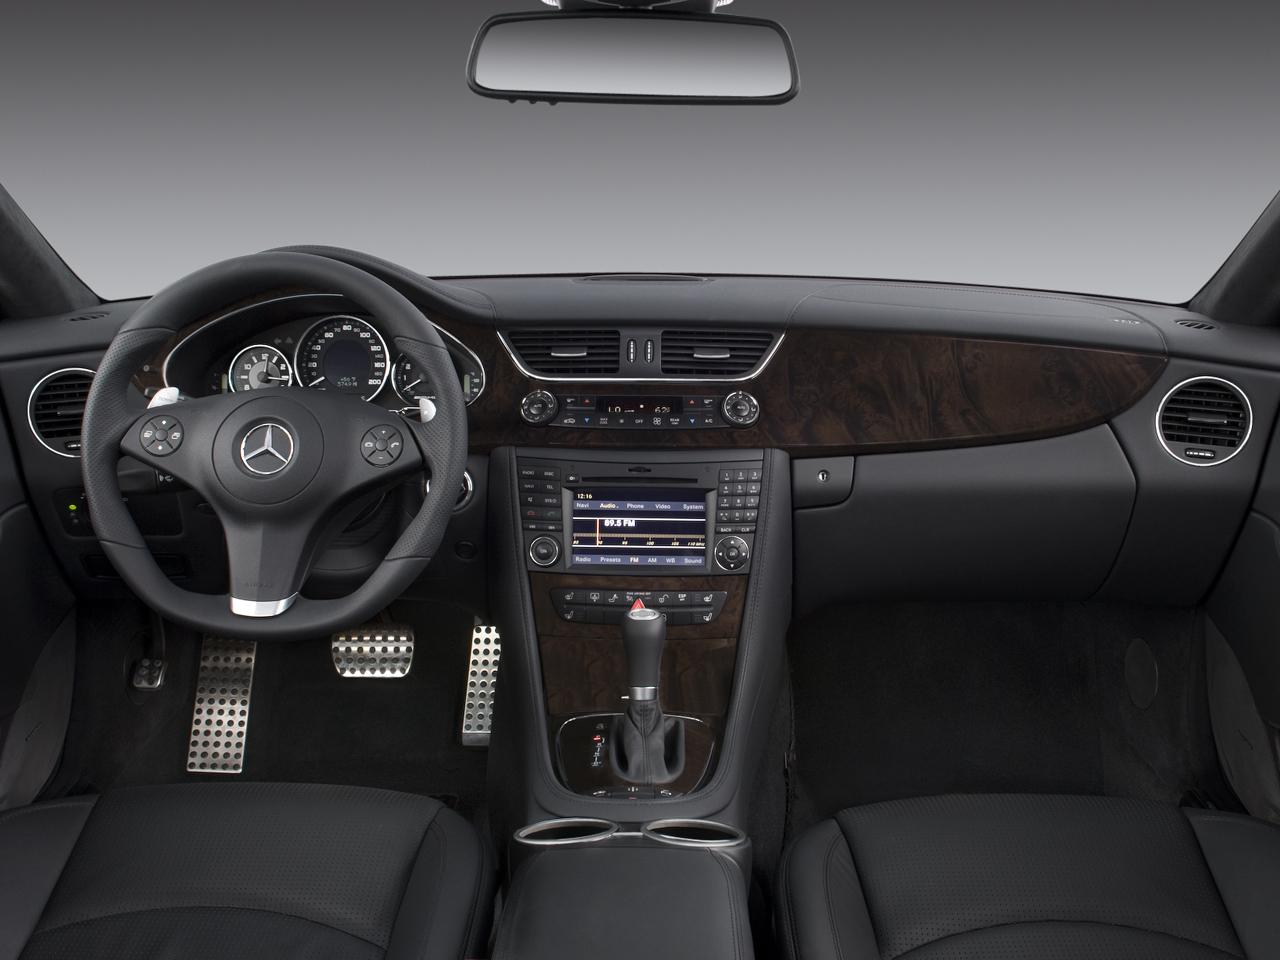 2009 Mercedes Benz Cls Class Image 17